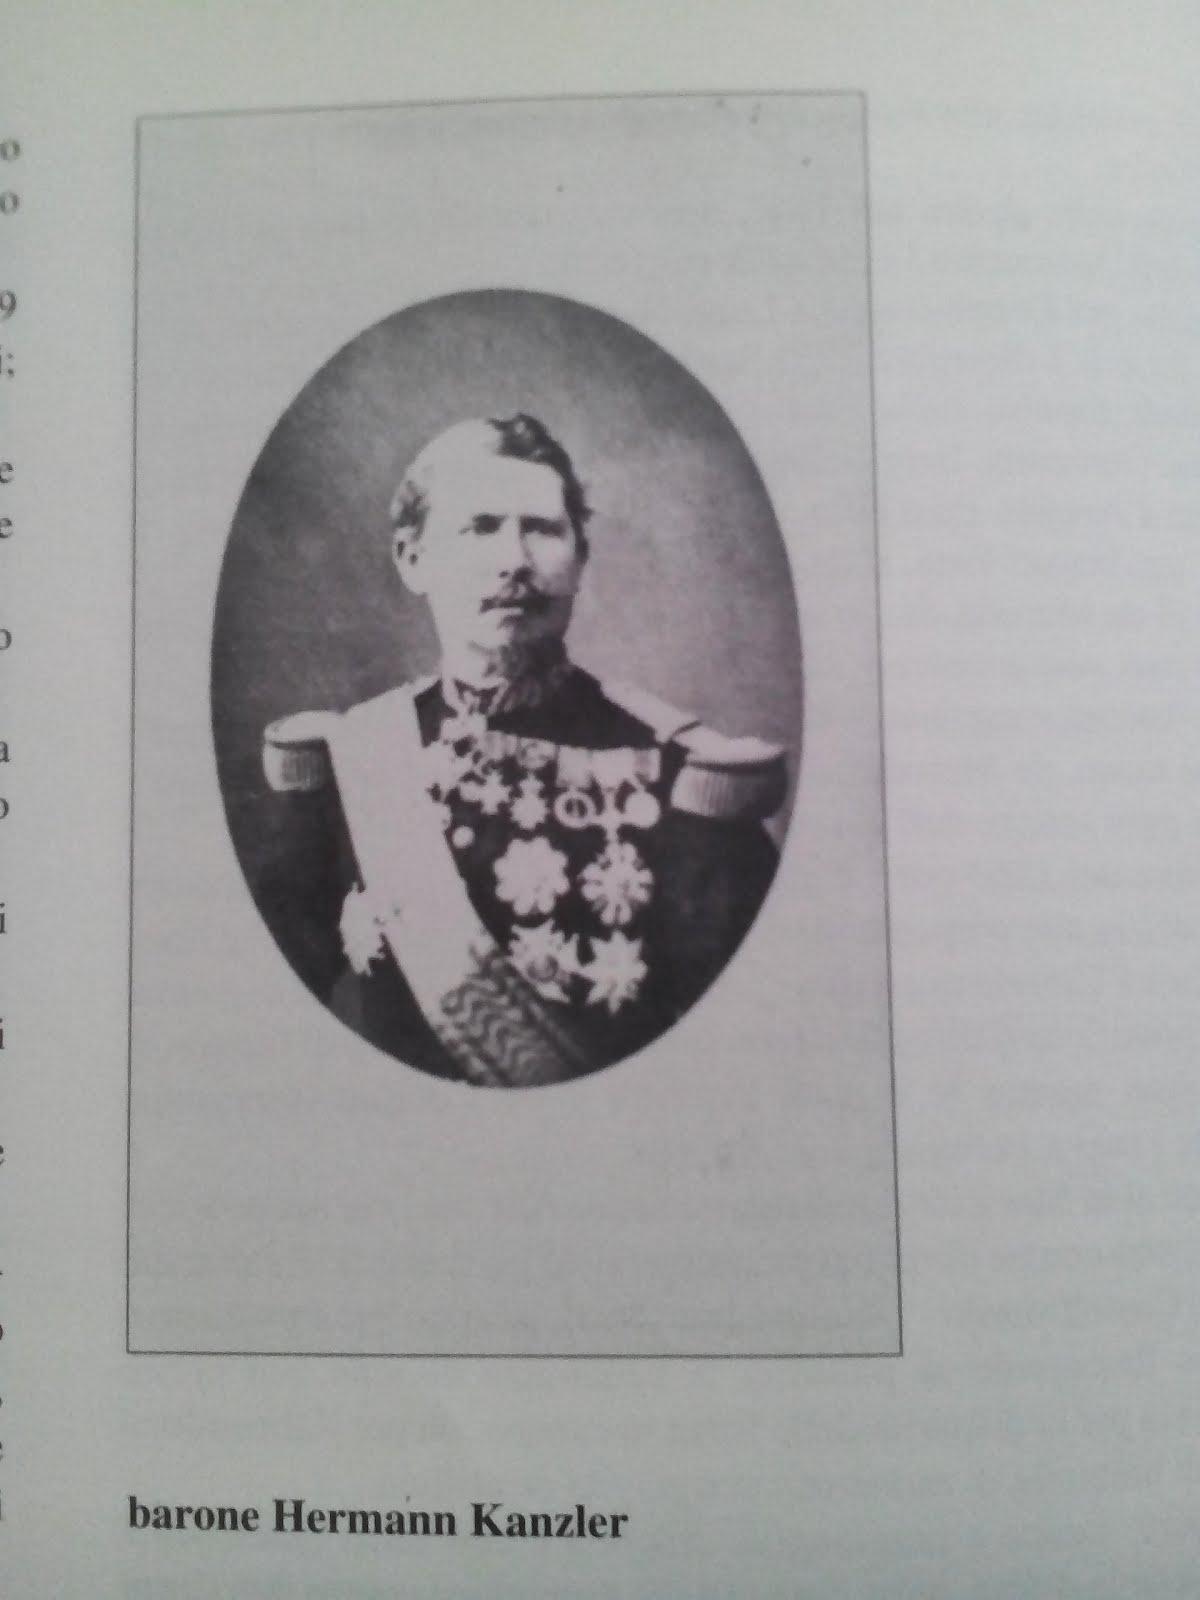 Kanzler, Hermann, barone